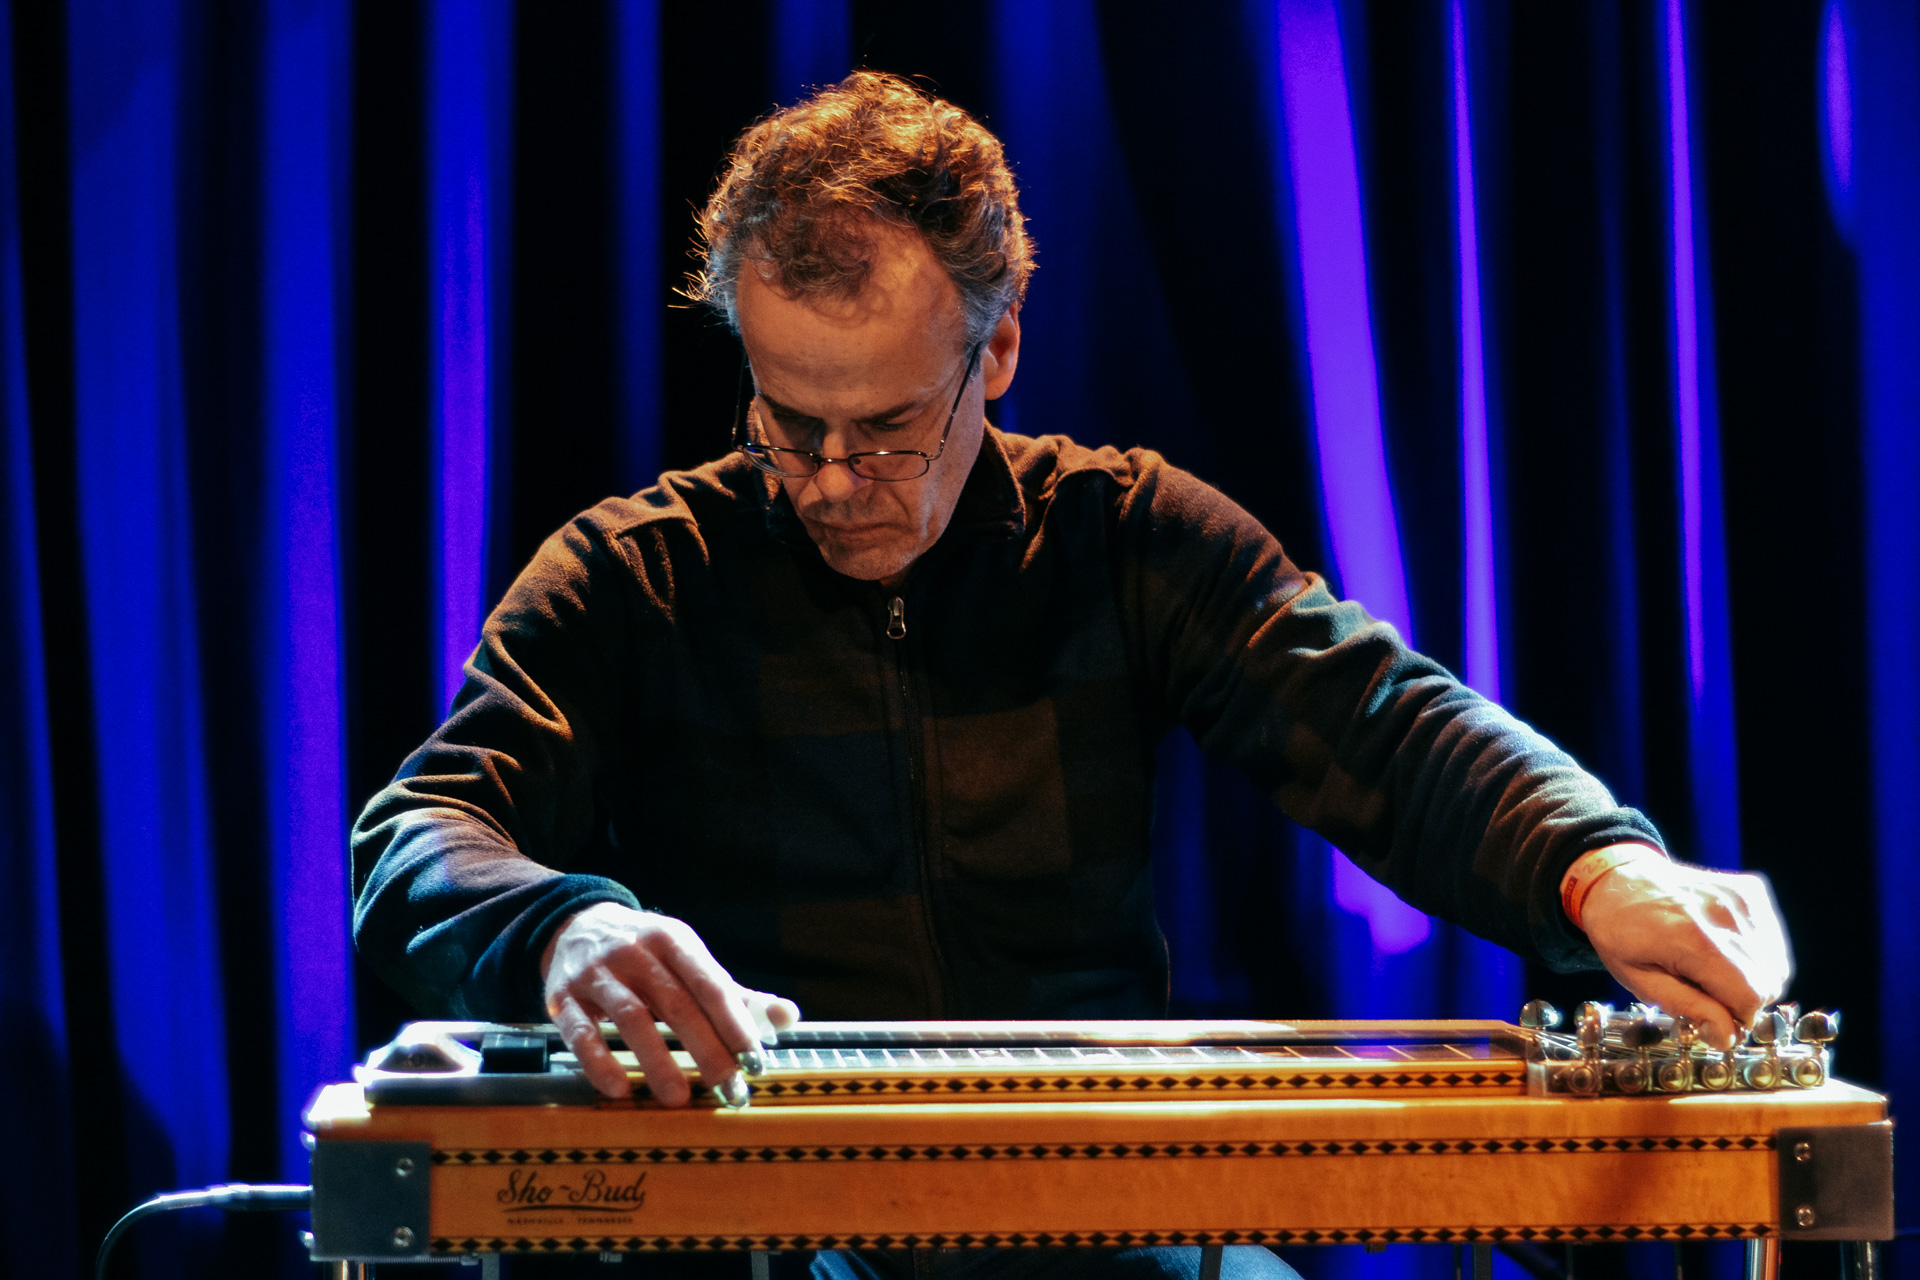 Paul Niehaus (Photo by Matthijs van der Ven for The Influences)